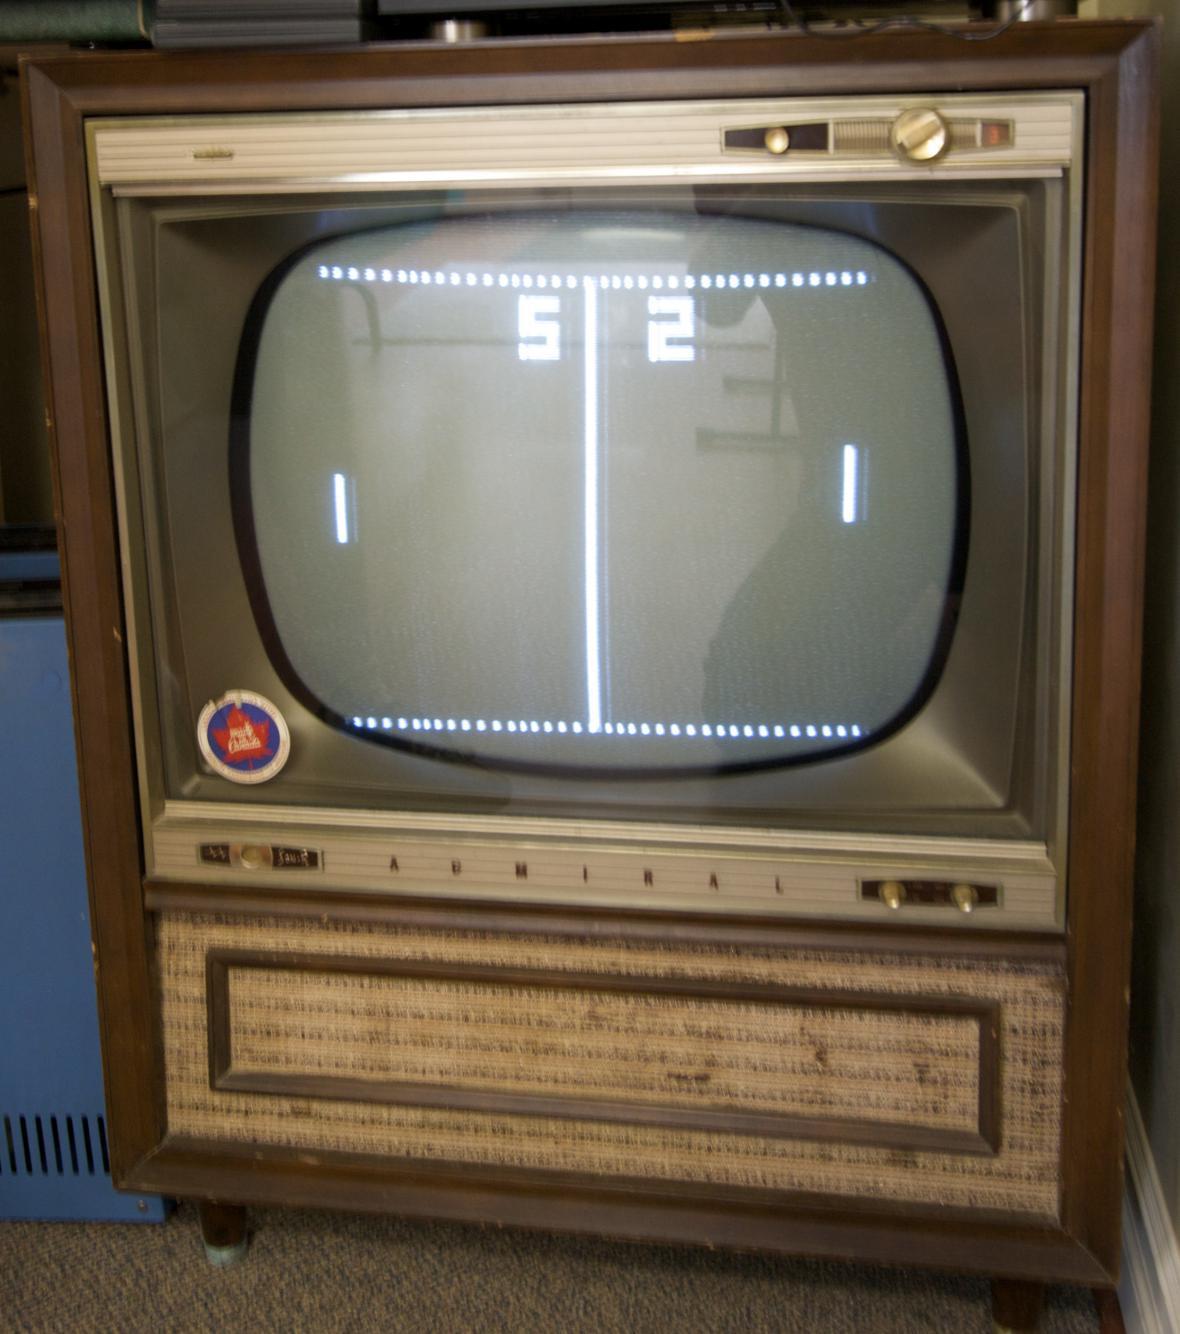 Pong odstartoval p ed 45 lety revoluci ve videohr ch tv rce dostal zad n a to zvl dne i - Ancienne console de jeux ...